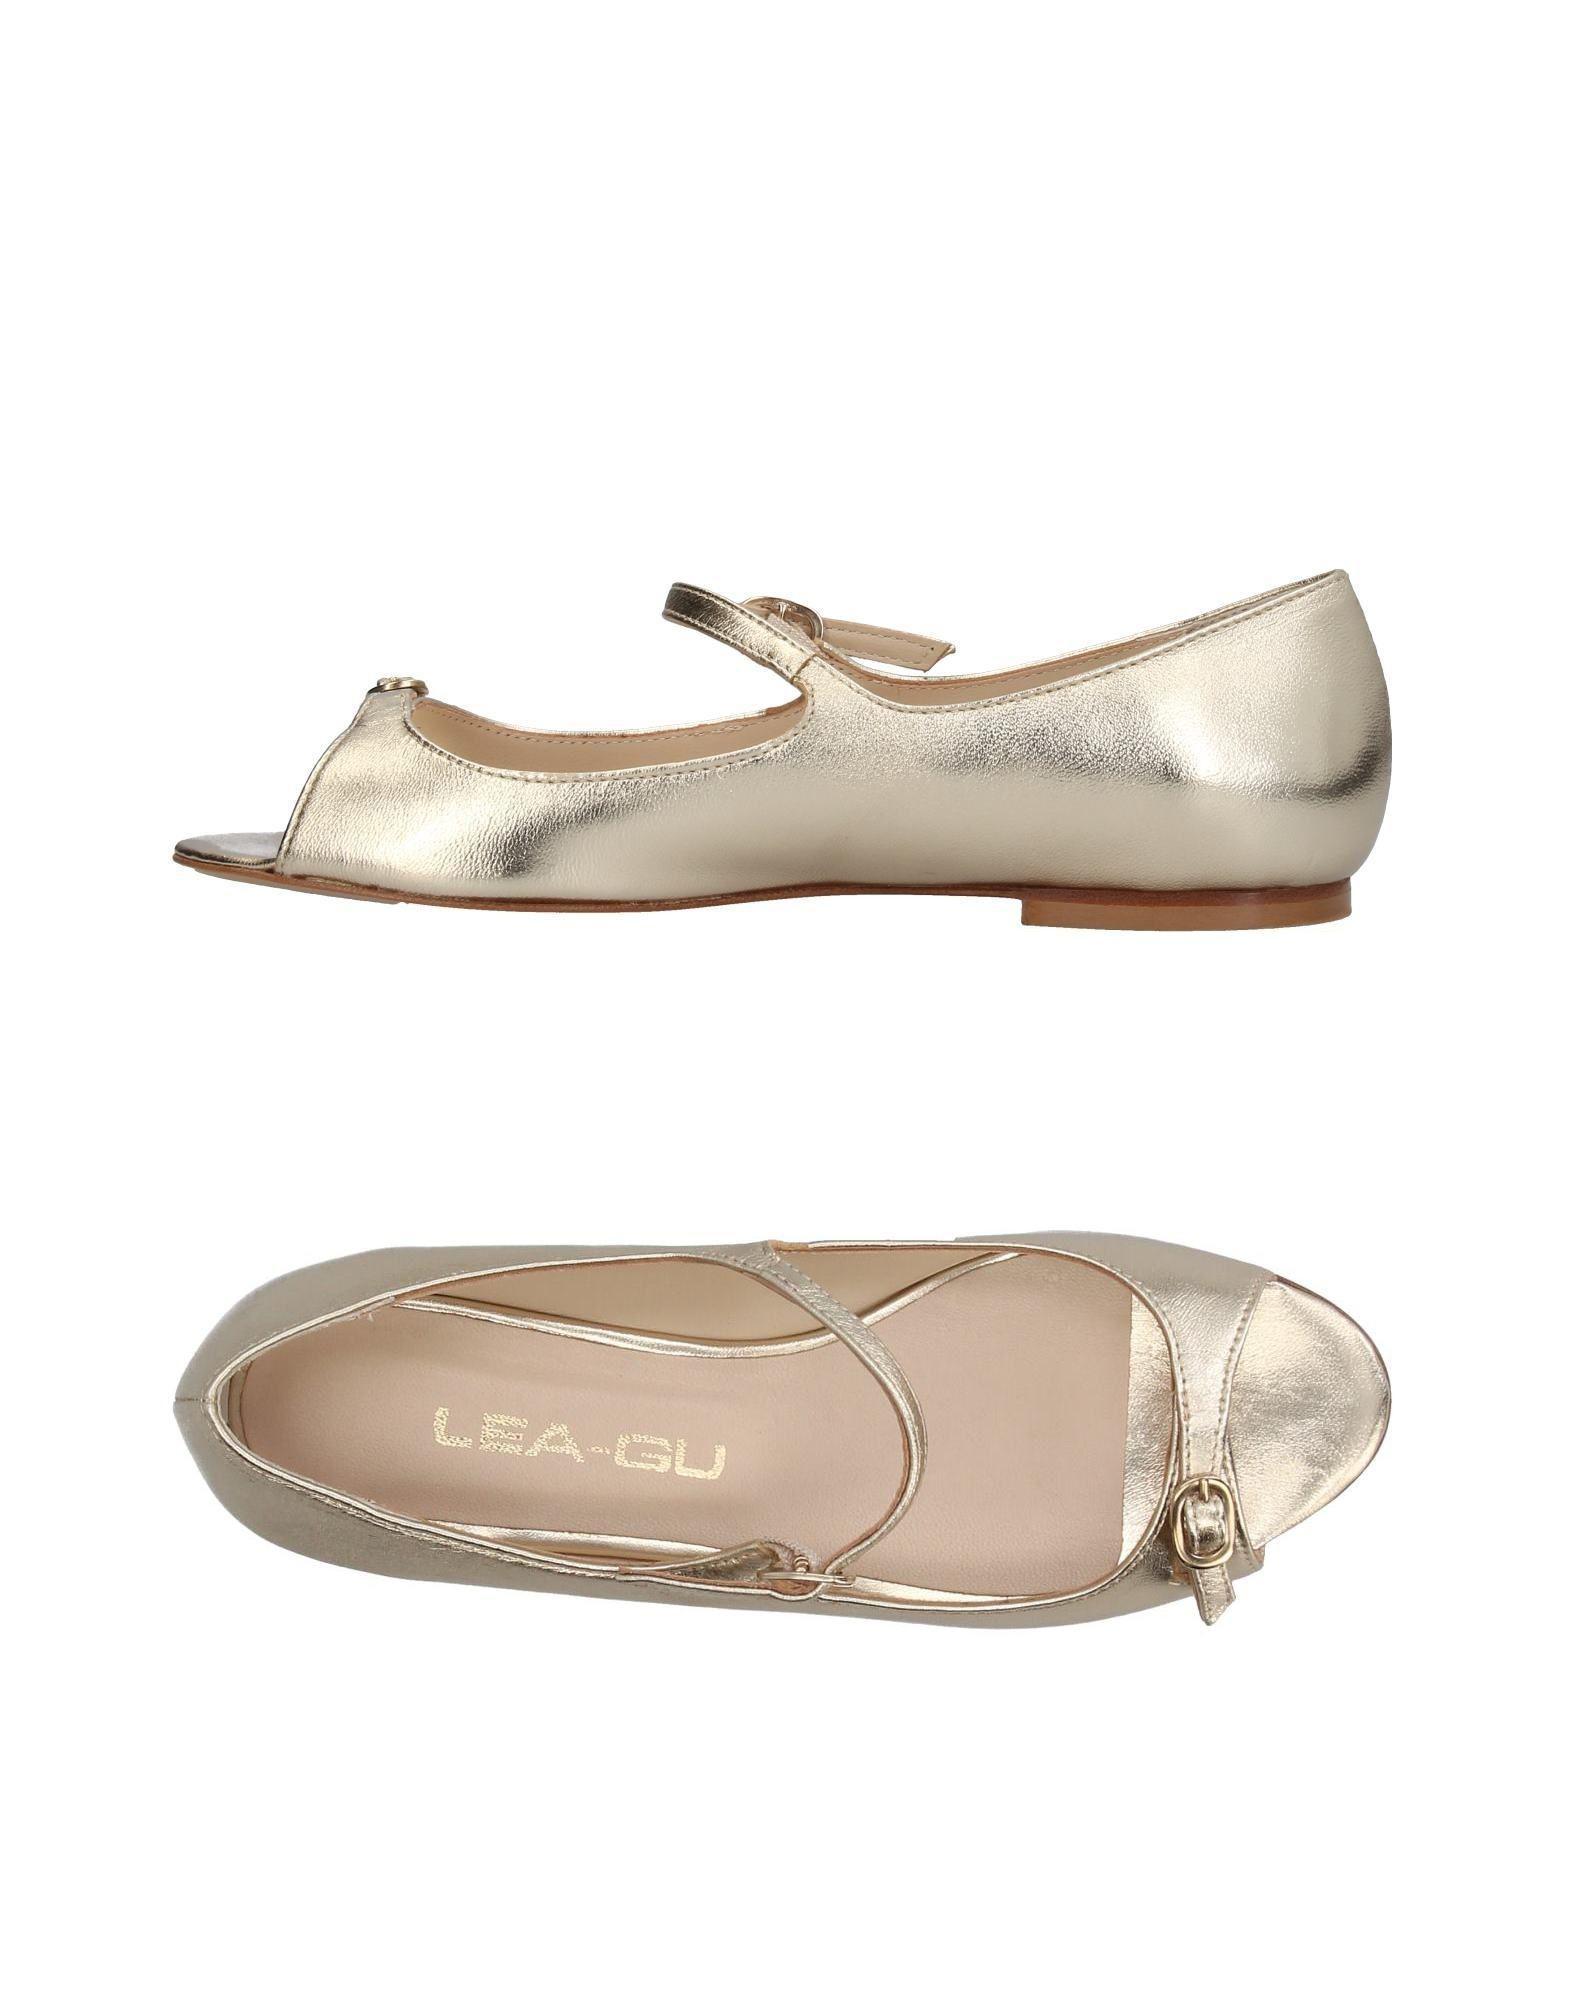 Chaussures - Ballerines-gu Ica 4q6pmBN1la